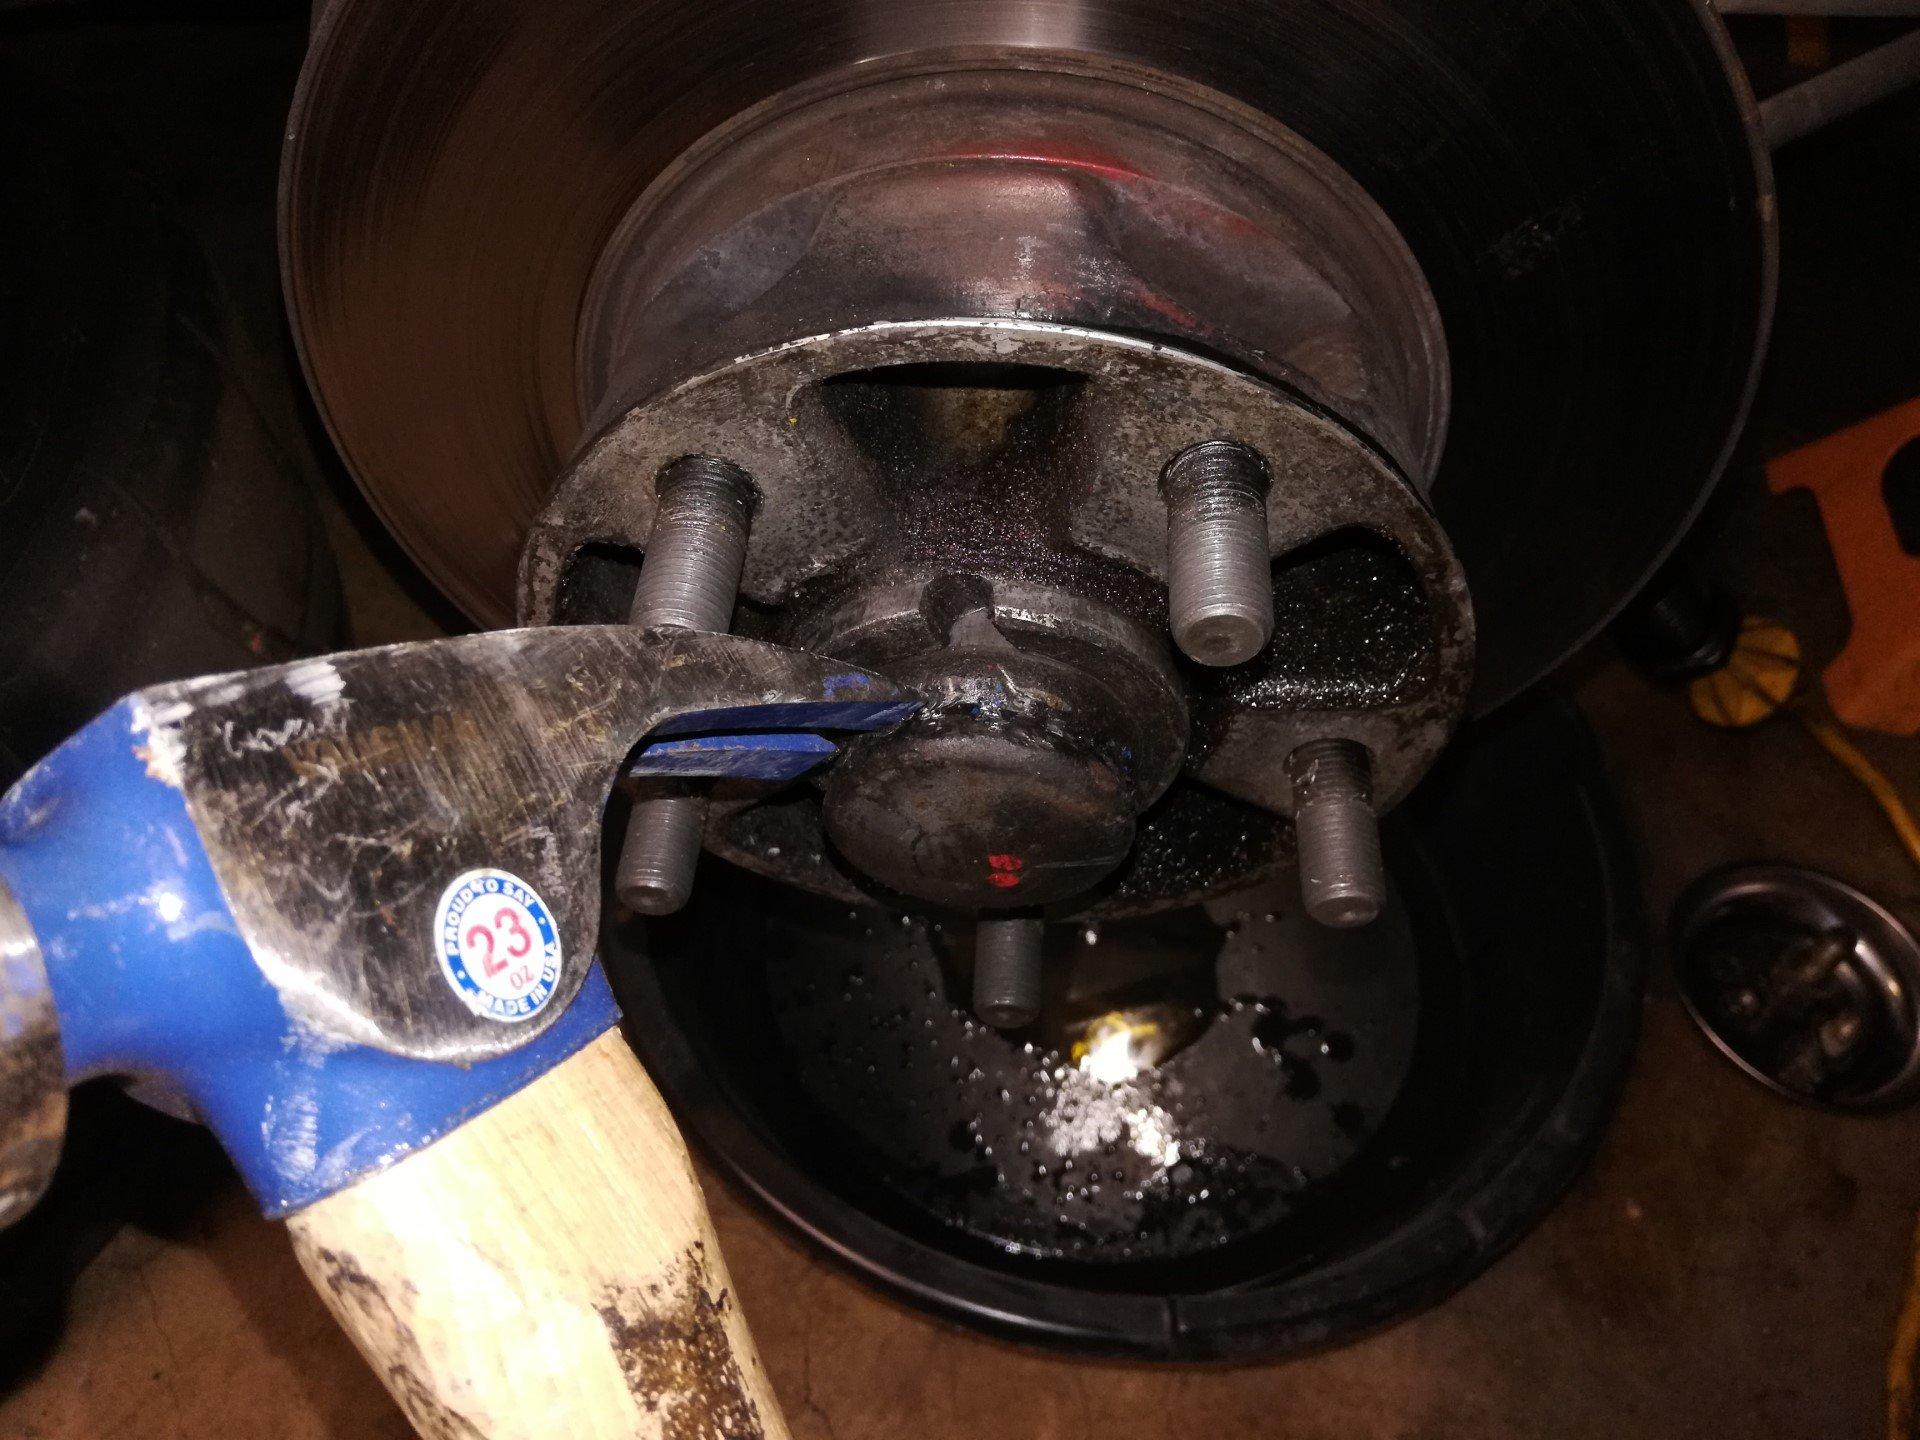 Air-cooled Porsche 911 front wheel hub dust cap removal